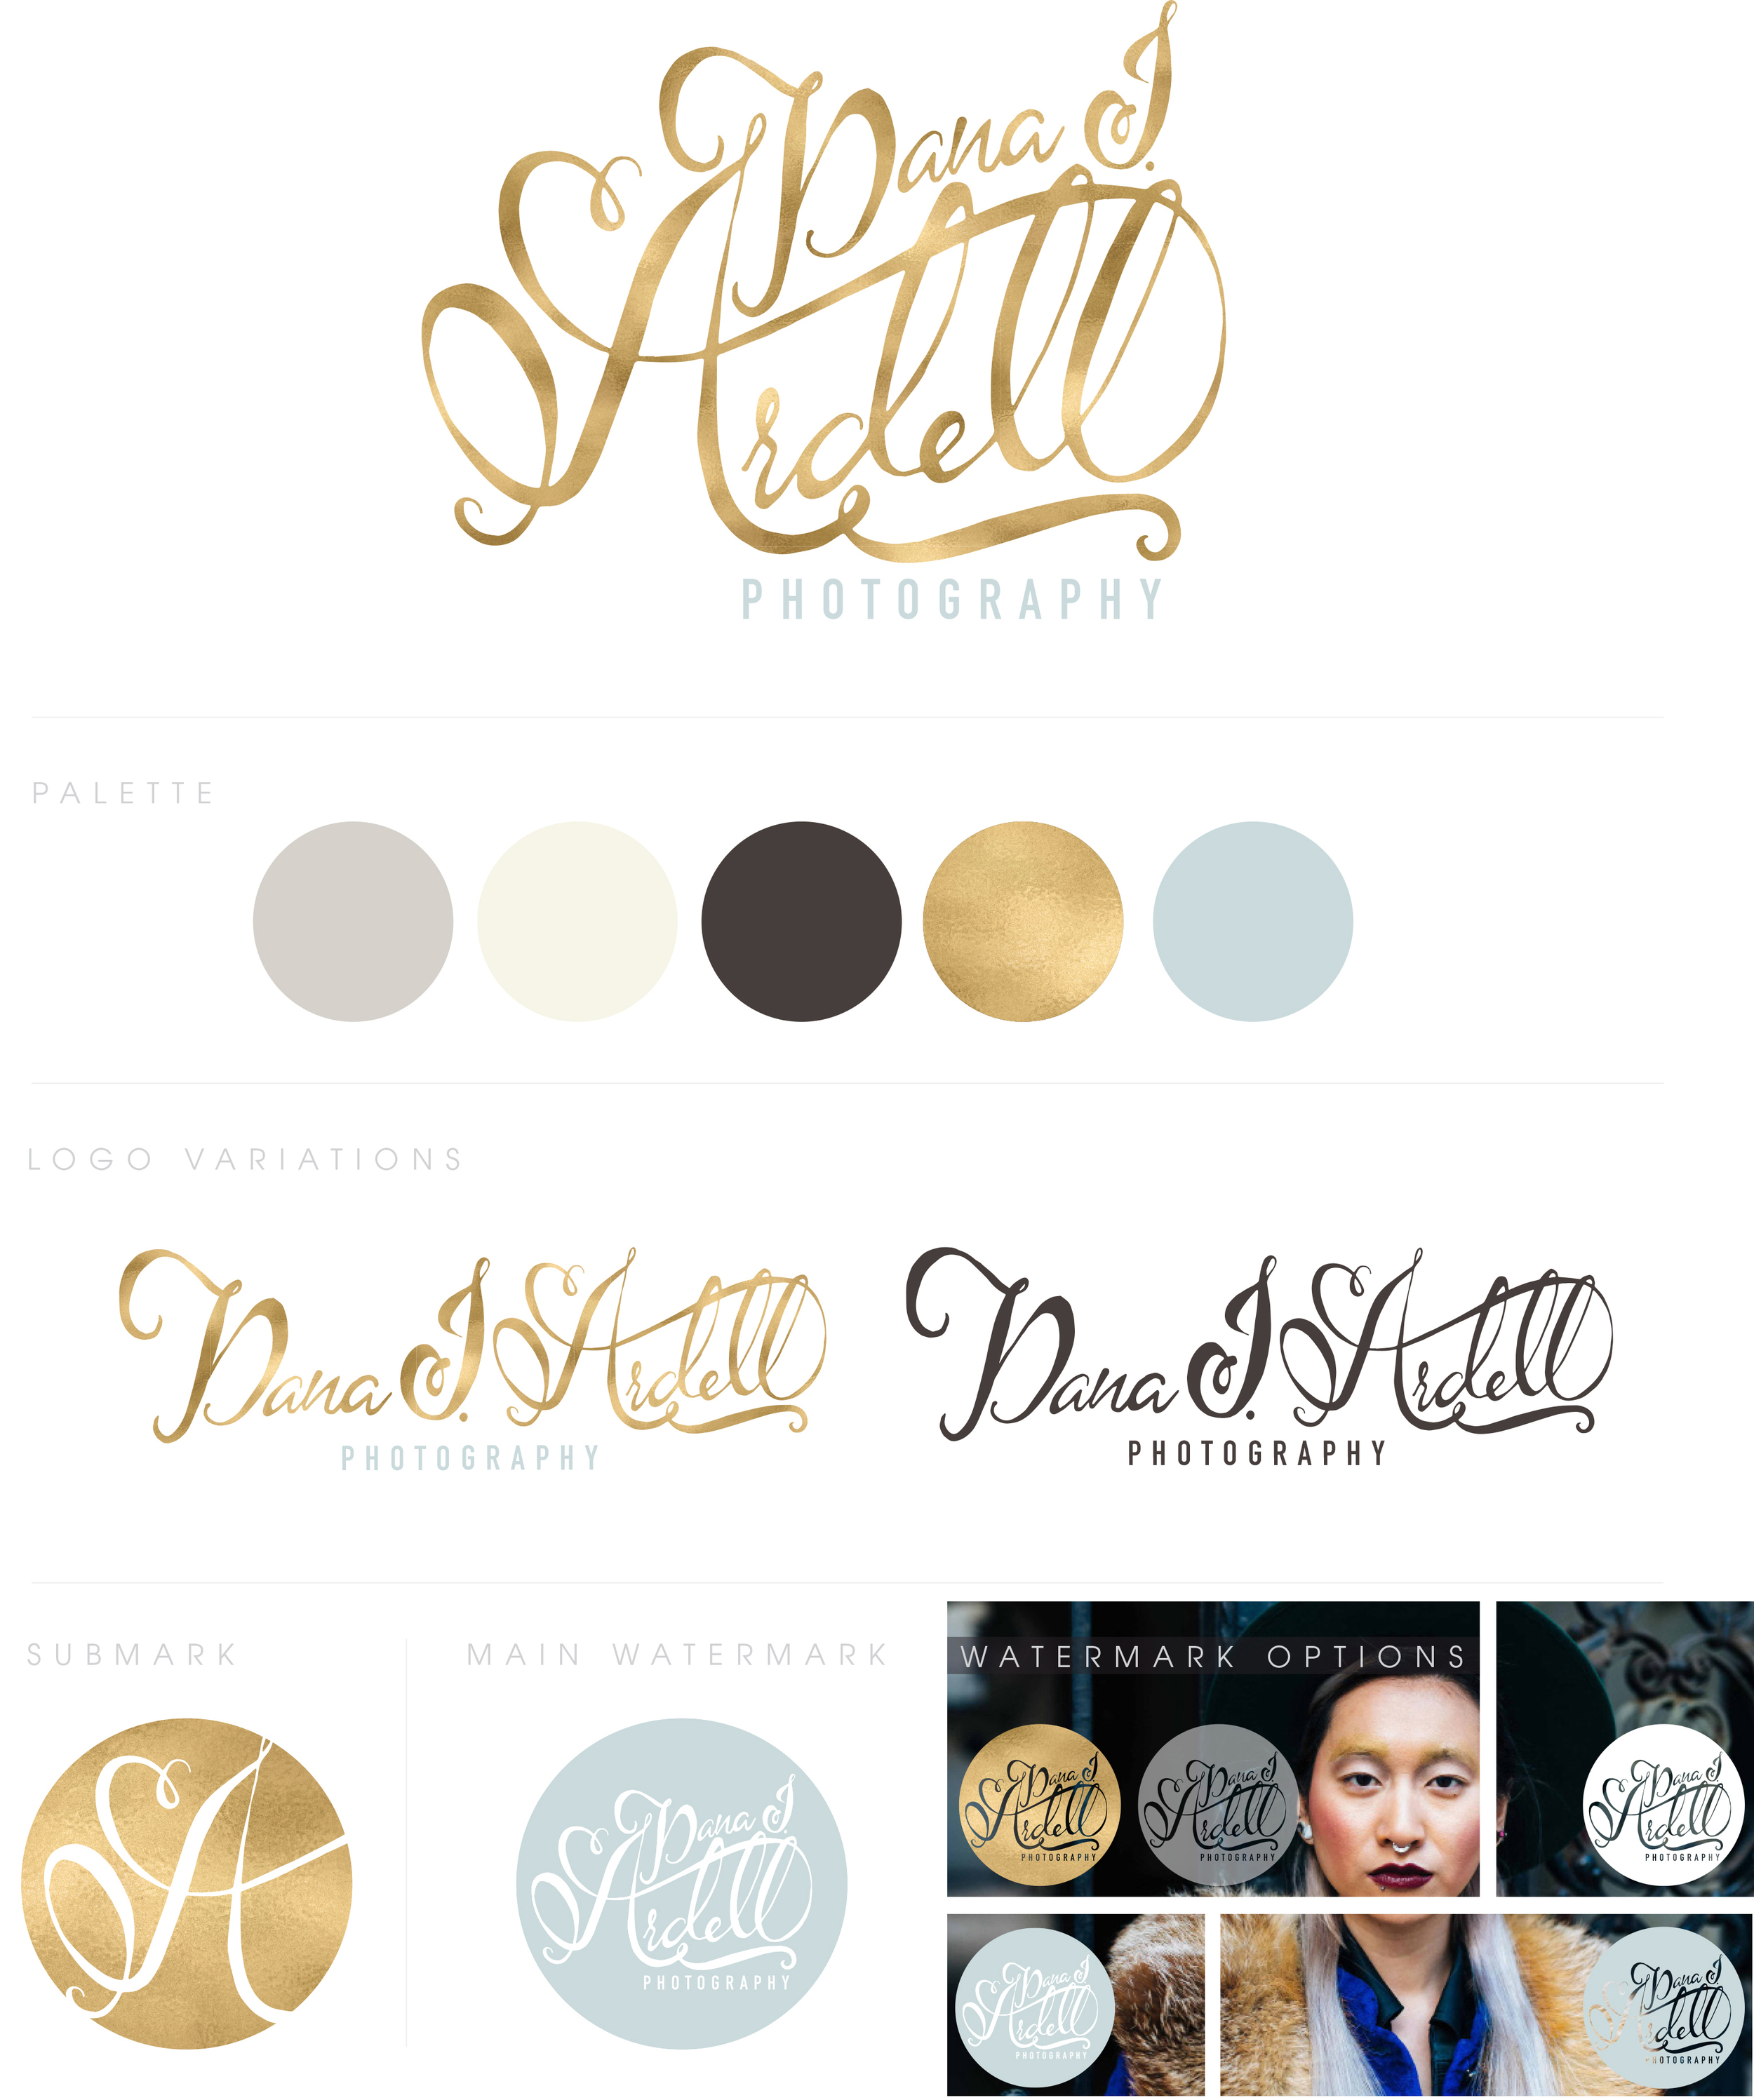 dana-j-ardell-photography-branding-logo